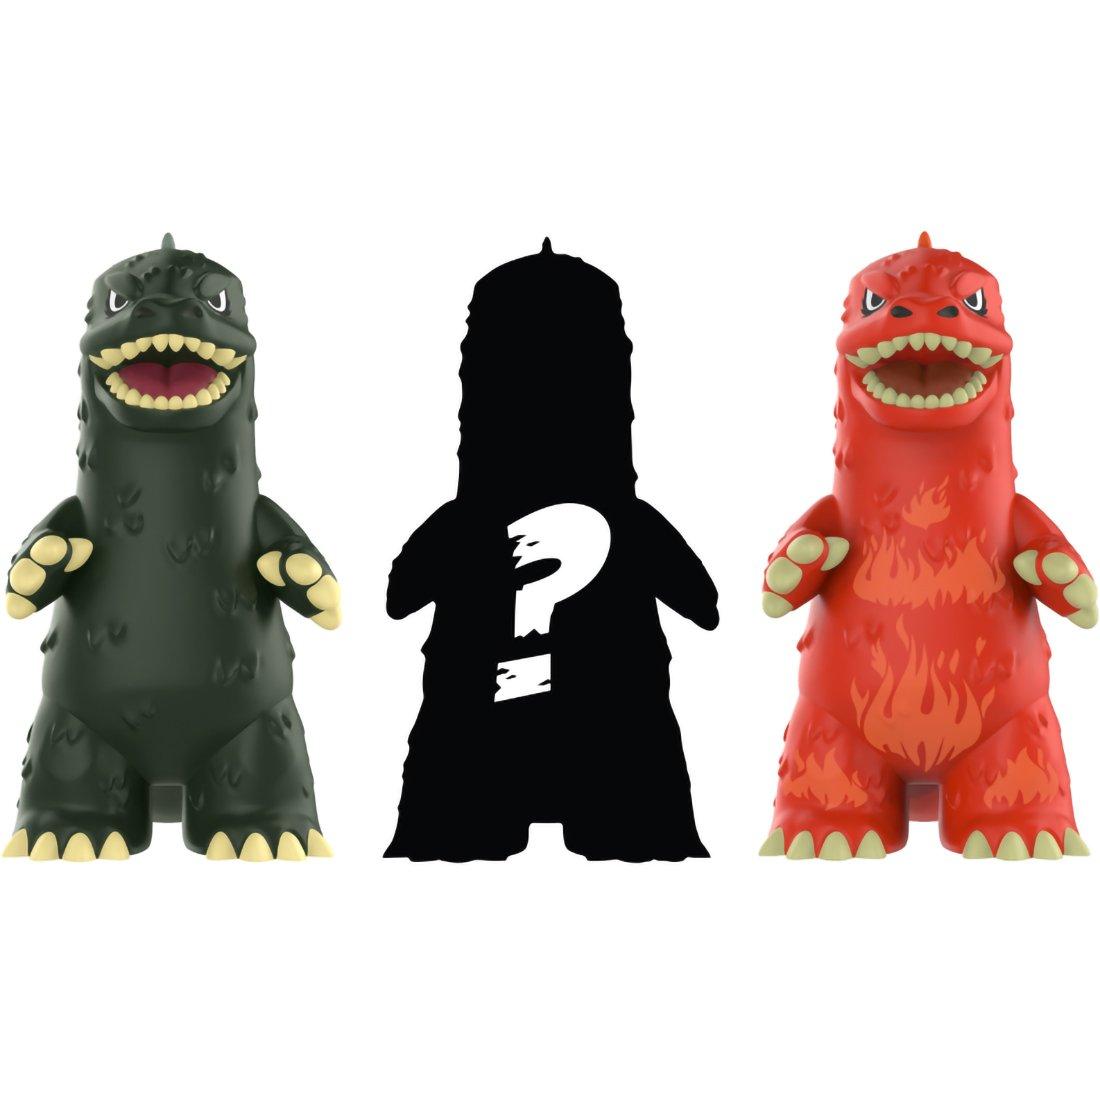 23361 1 Official Godzilla Trading Card Bundle Godzilla x Mystery Minis 3-Mini Vinyl Figure Pack Funko Godzilla